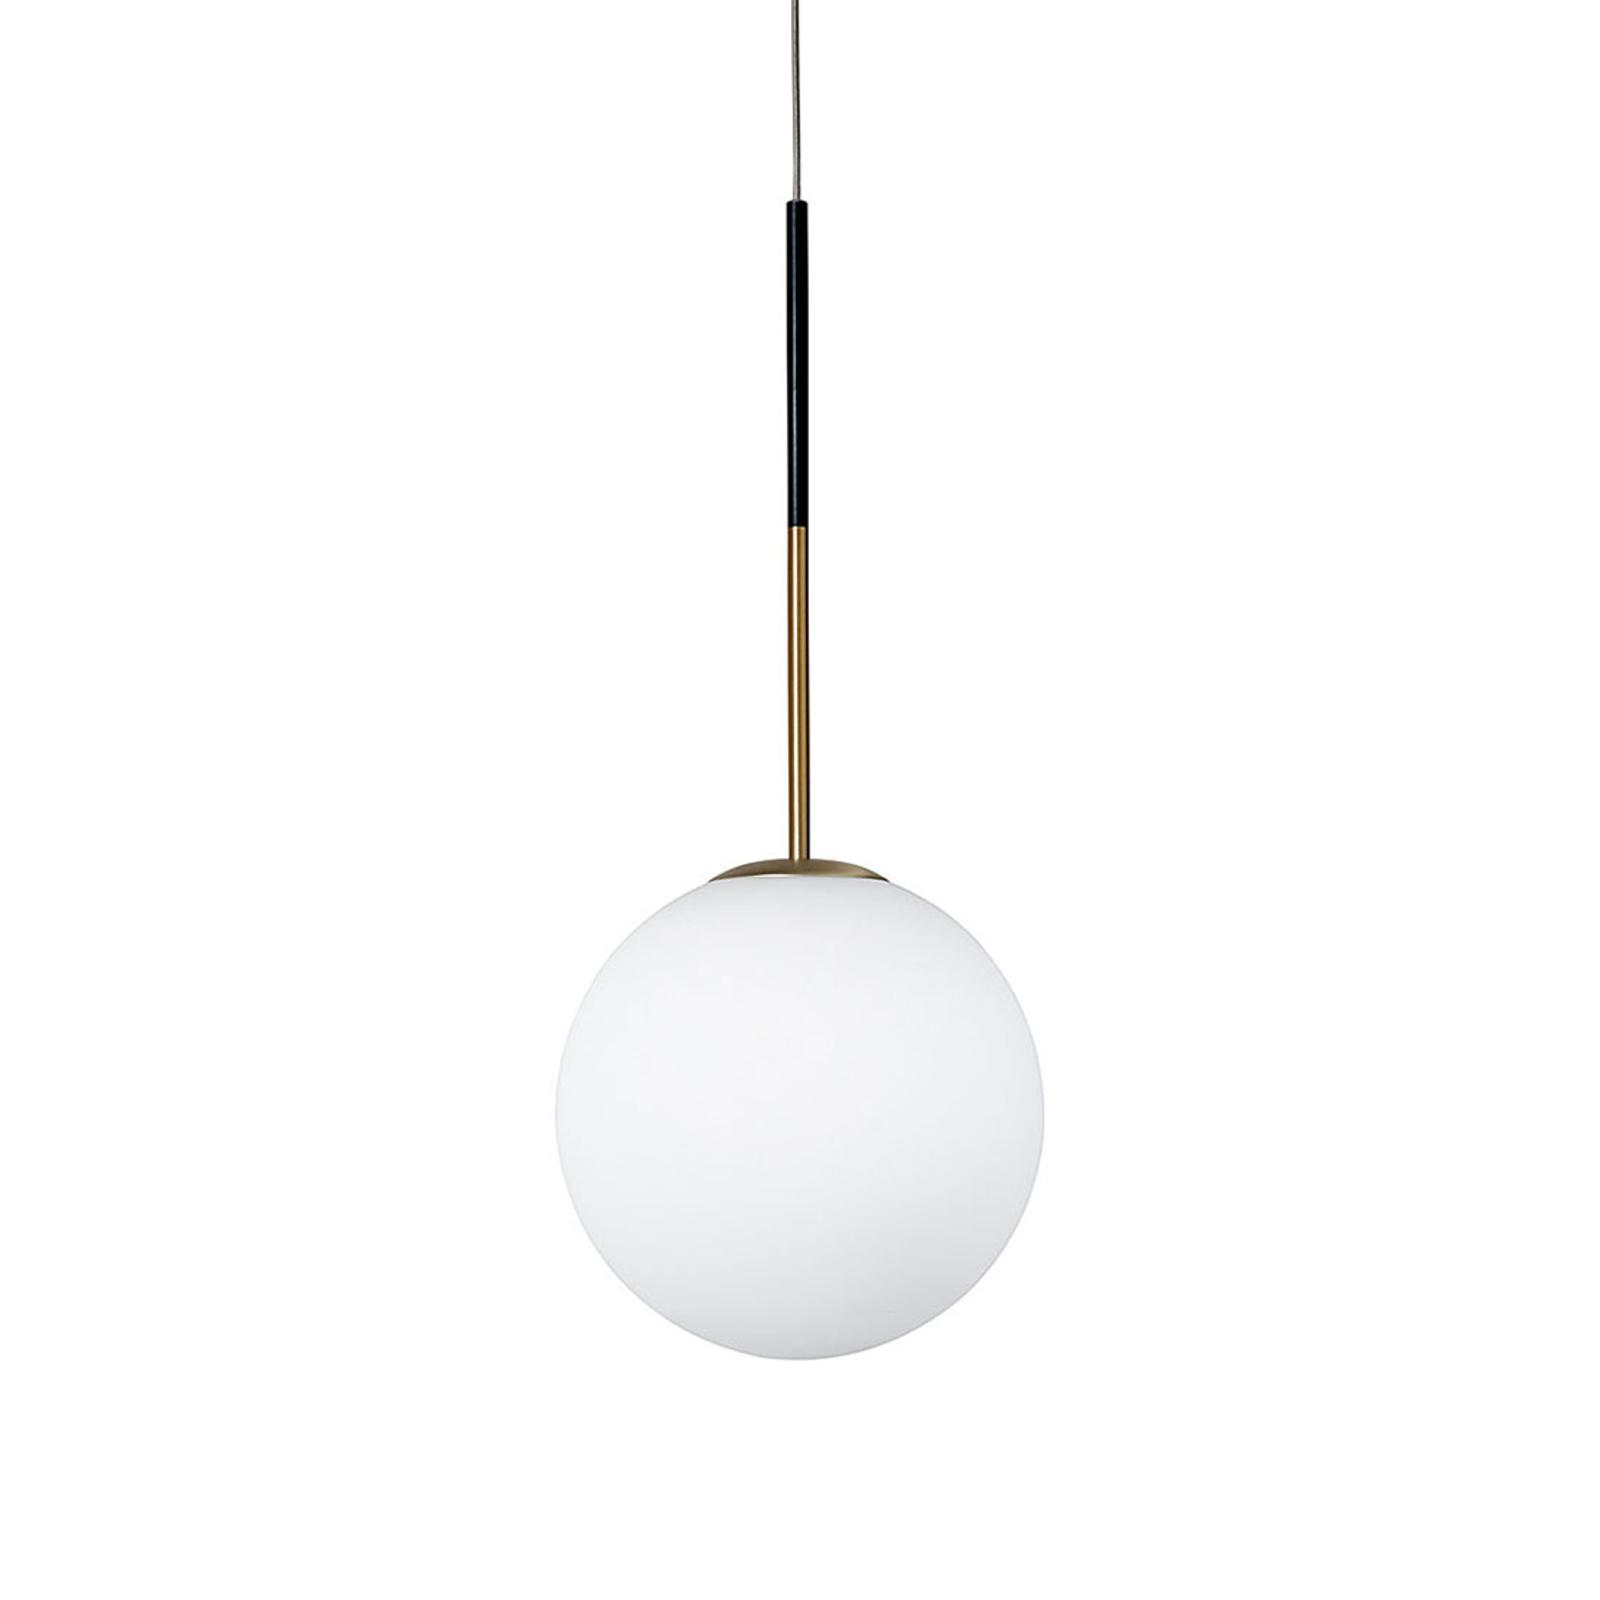 Lampa wisząca Jugen 1-punktowa